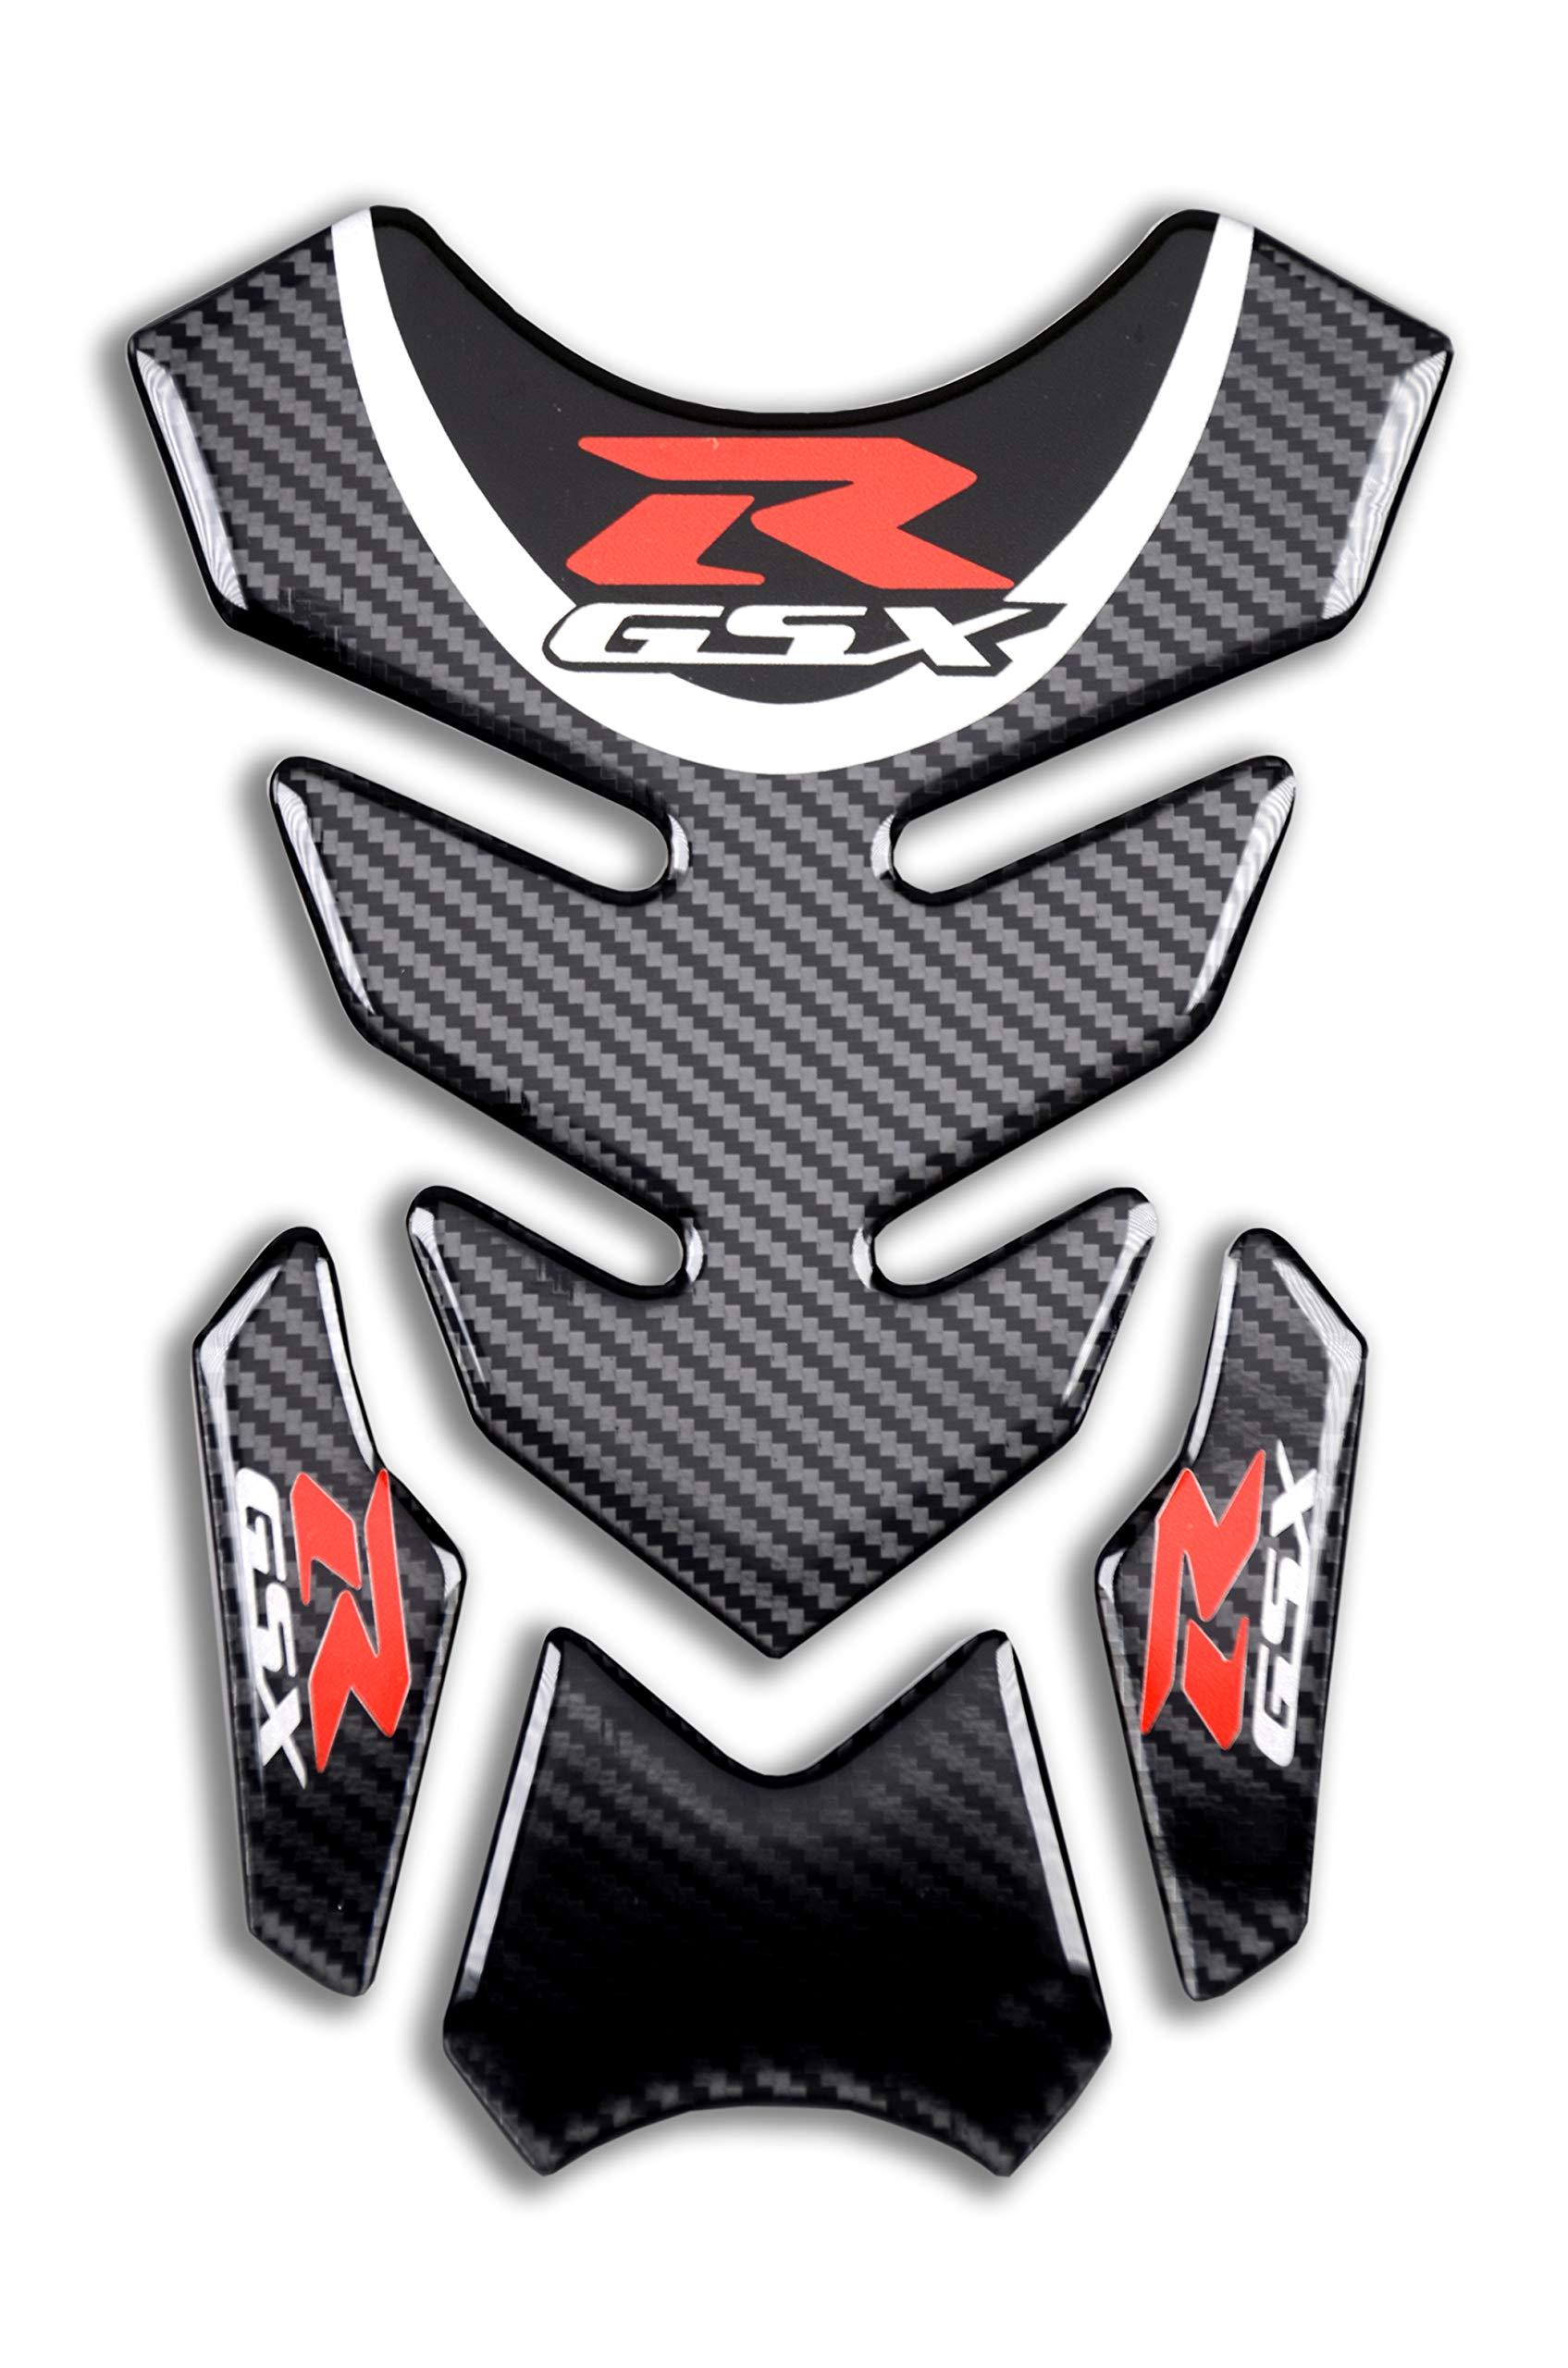 D-Power Real Carbon look Motorcycle Sticker Vinyl Decal Emblem Protection Gas Tank protector GSXR Tank pad For SUZUKI Gixxer GSXR 600 750 2006-2016 / GSXR1000 2007-2008 GSXR1300 Hayabusa 2008-2016